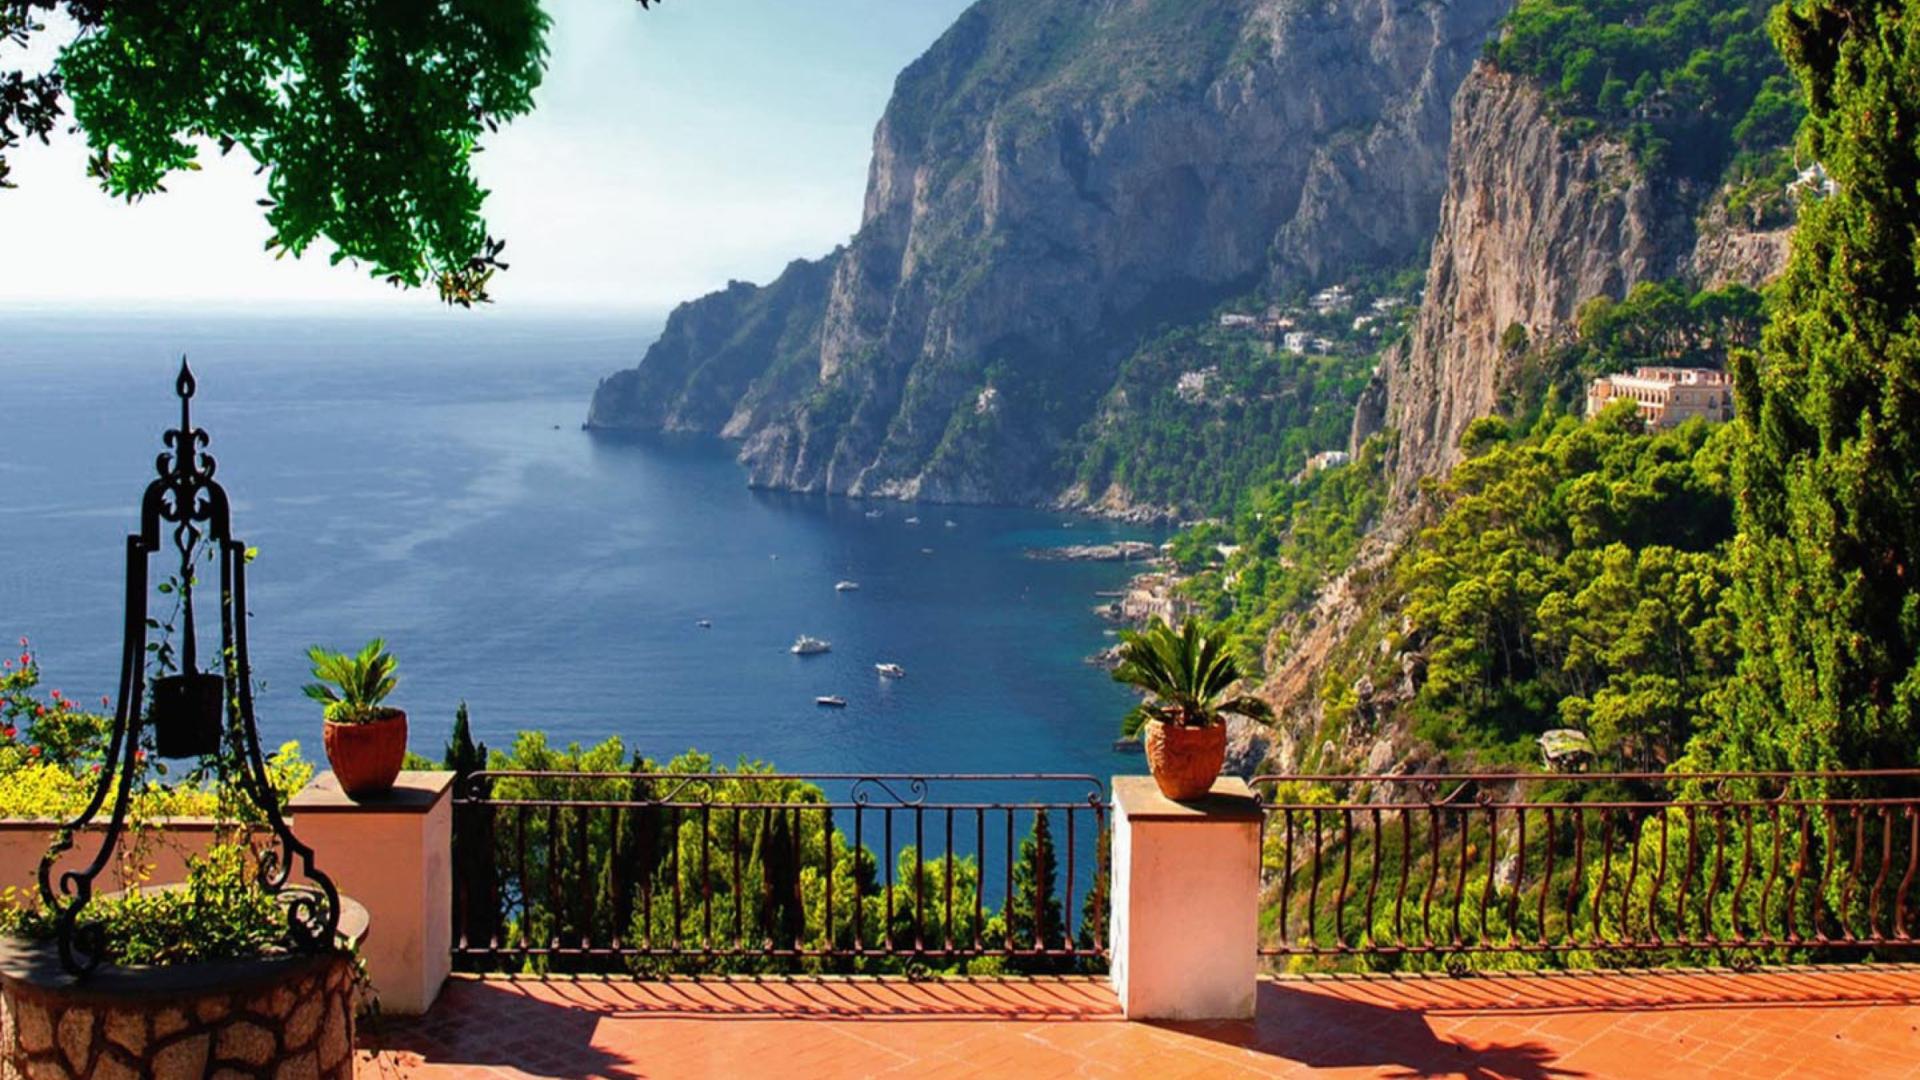 Capri Terrace View Sfondi Gratuiti Per Desktop 1920x1080